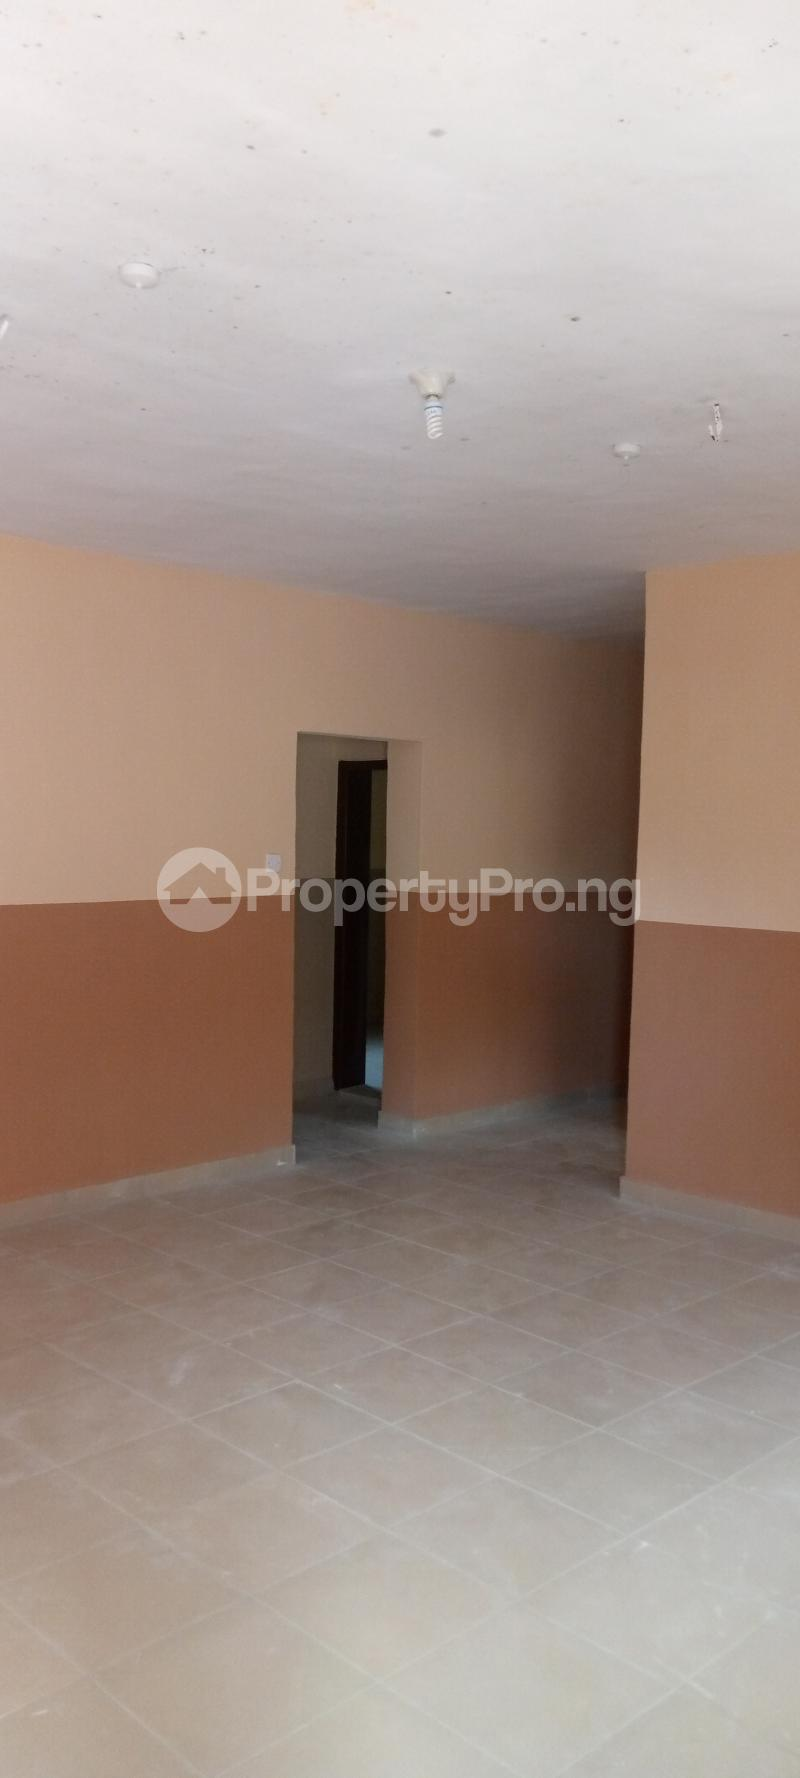 3 bedroom Blocks of Flats House for rent Basin area Ilorin Kwara - 6